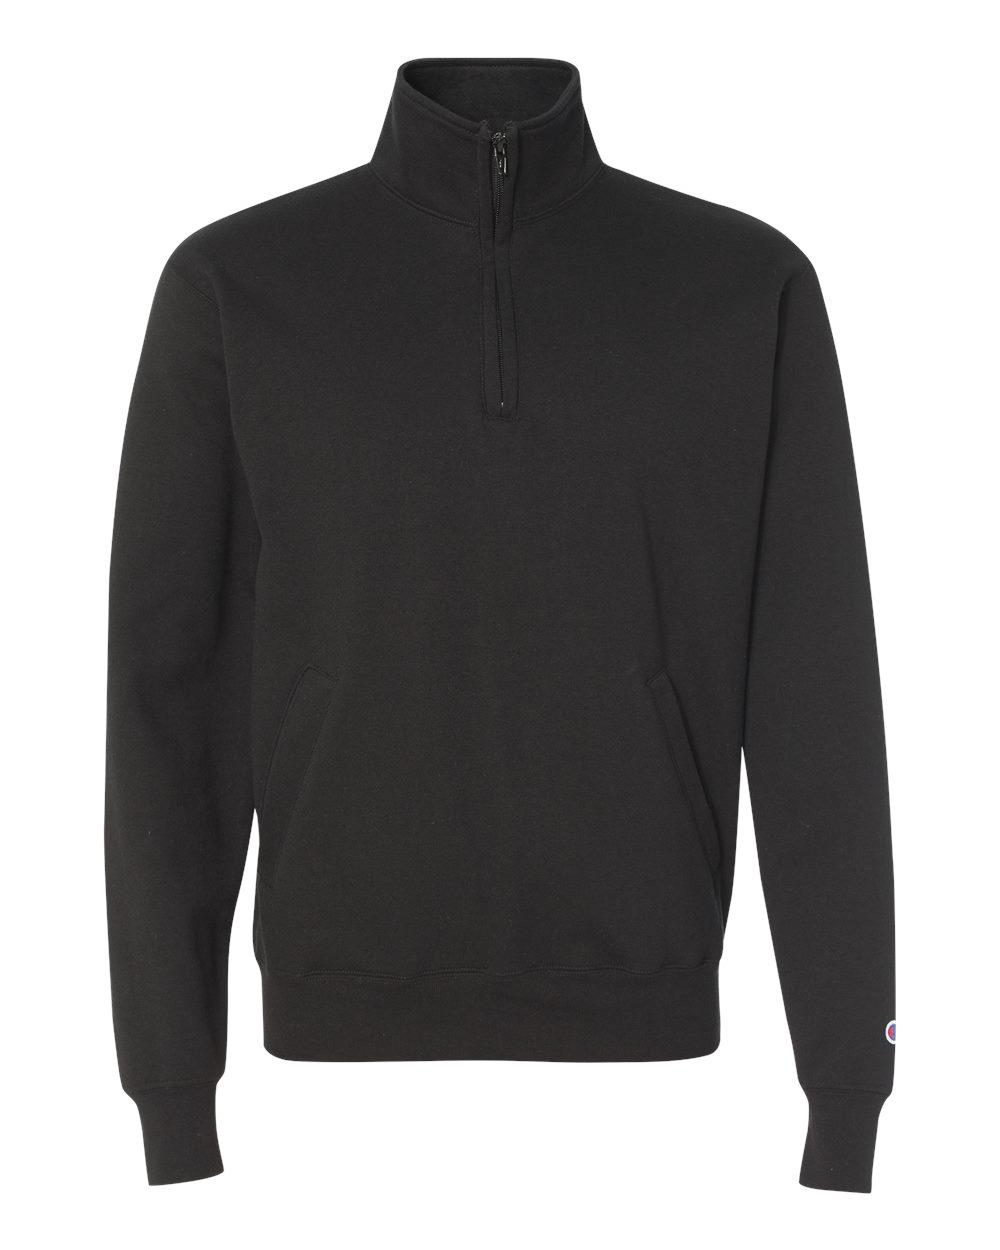 Champion-Mens-Double-Dry-Eco-Quarter-Zip-Pullover-Sweatshirt-S400-up-to-3XL miniature 6